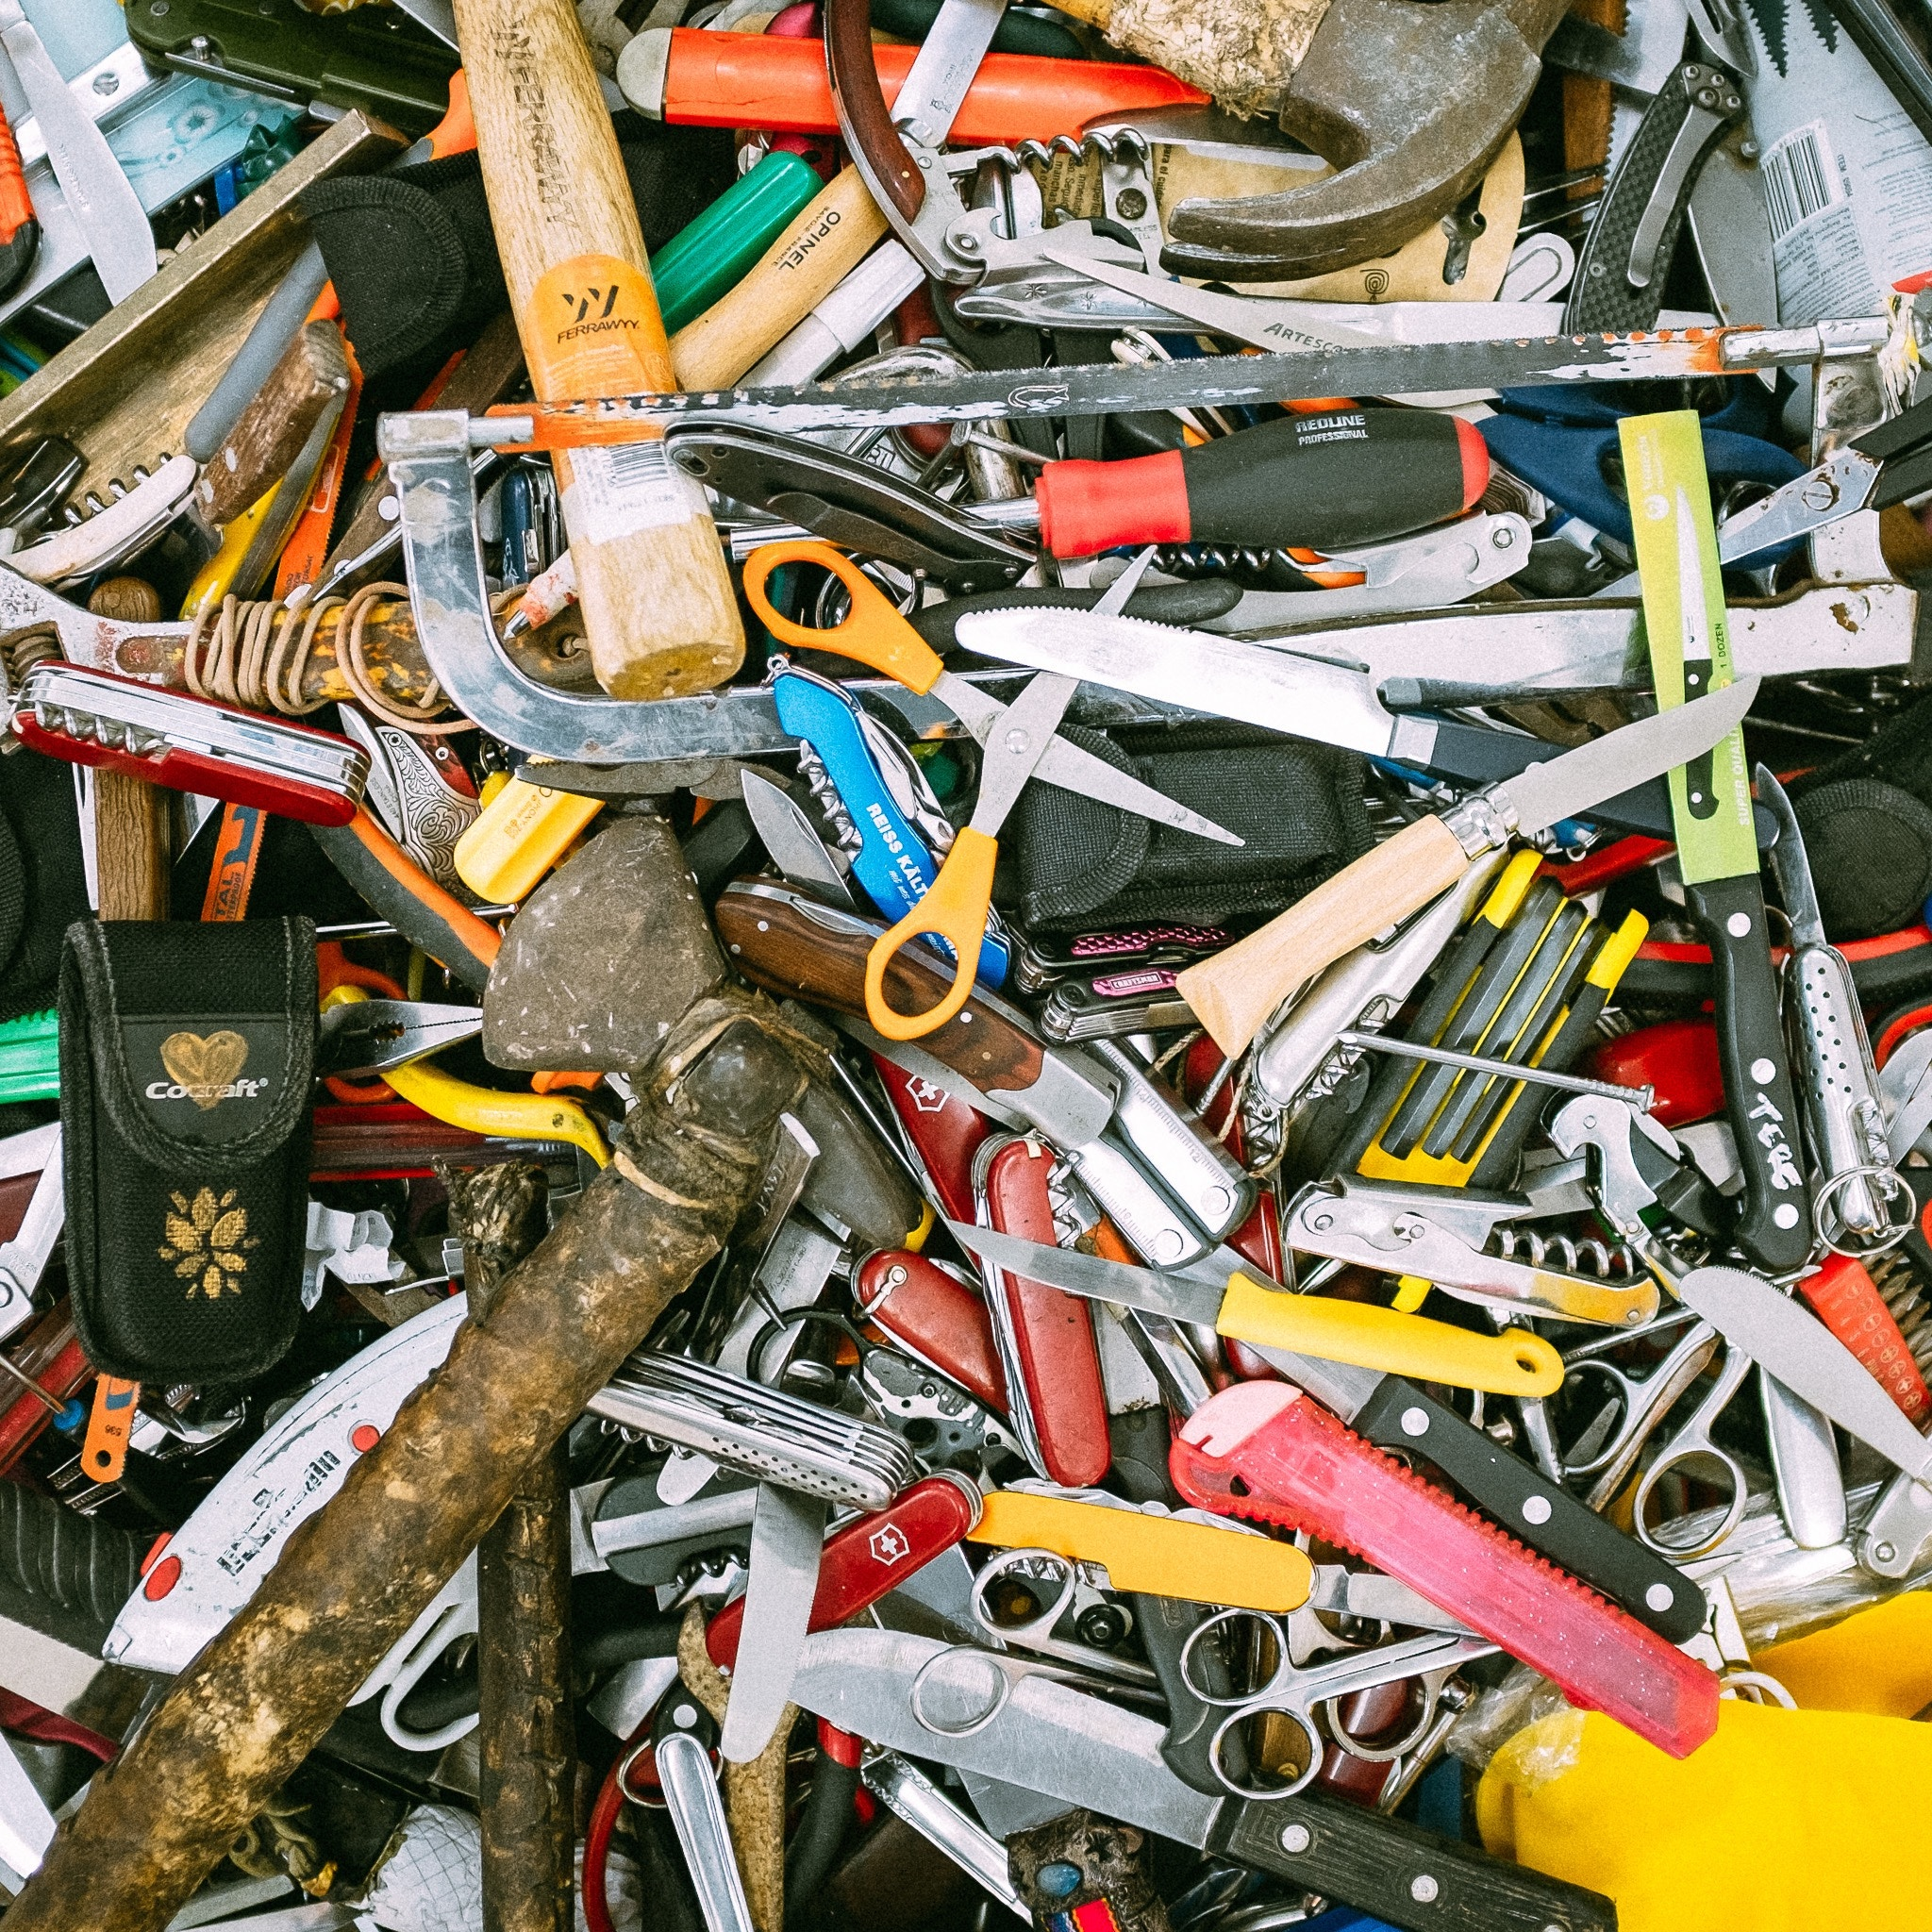 Mid-Missouri Hoarding Cleanup Photo by Ashim D'Silva on Unsplash